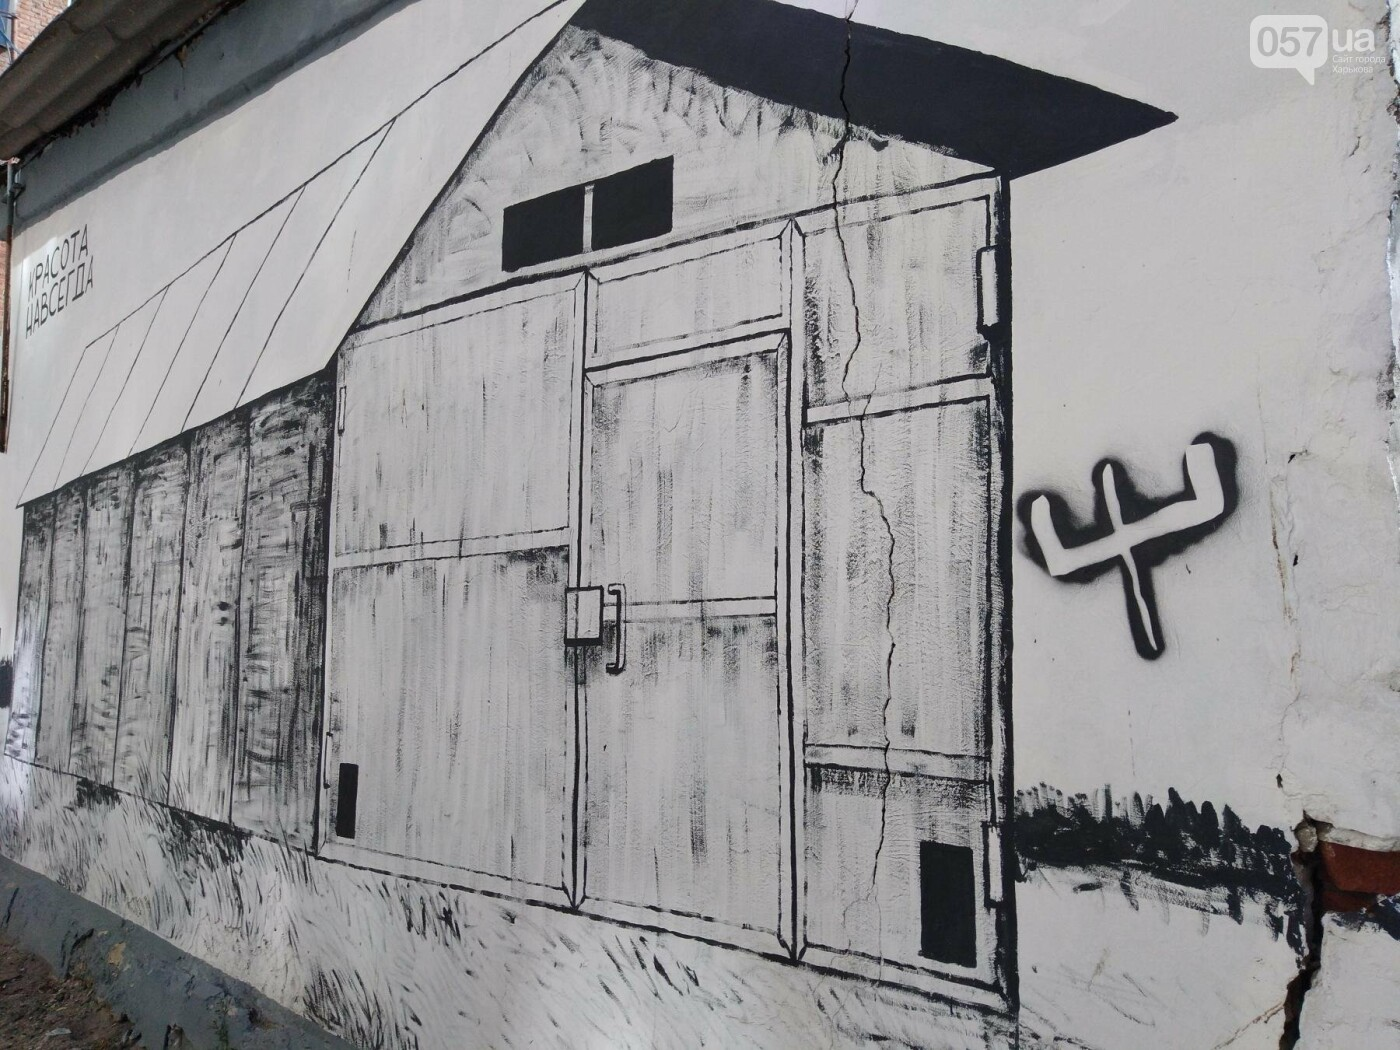 Стрит-арт Гамлета в Харькове: ТОП-10 граффити художника, - ФОТО, фото-3